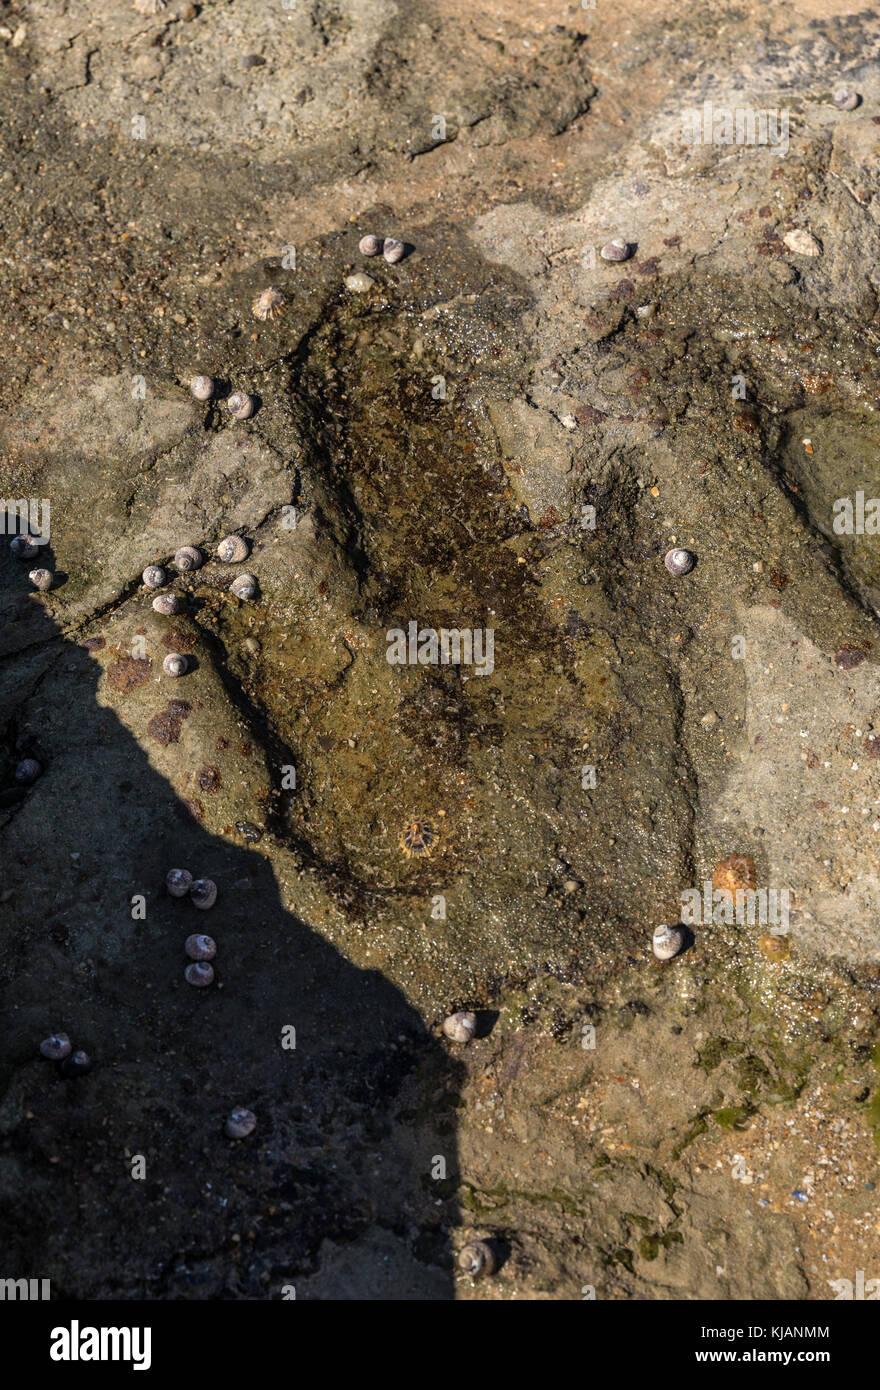 Dinosaur footprint in Talmont-Saint-Hilaire (Vendée, France) - Stock Image